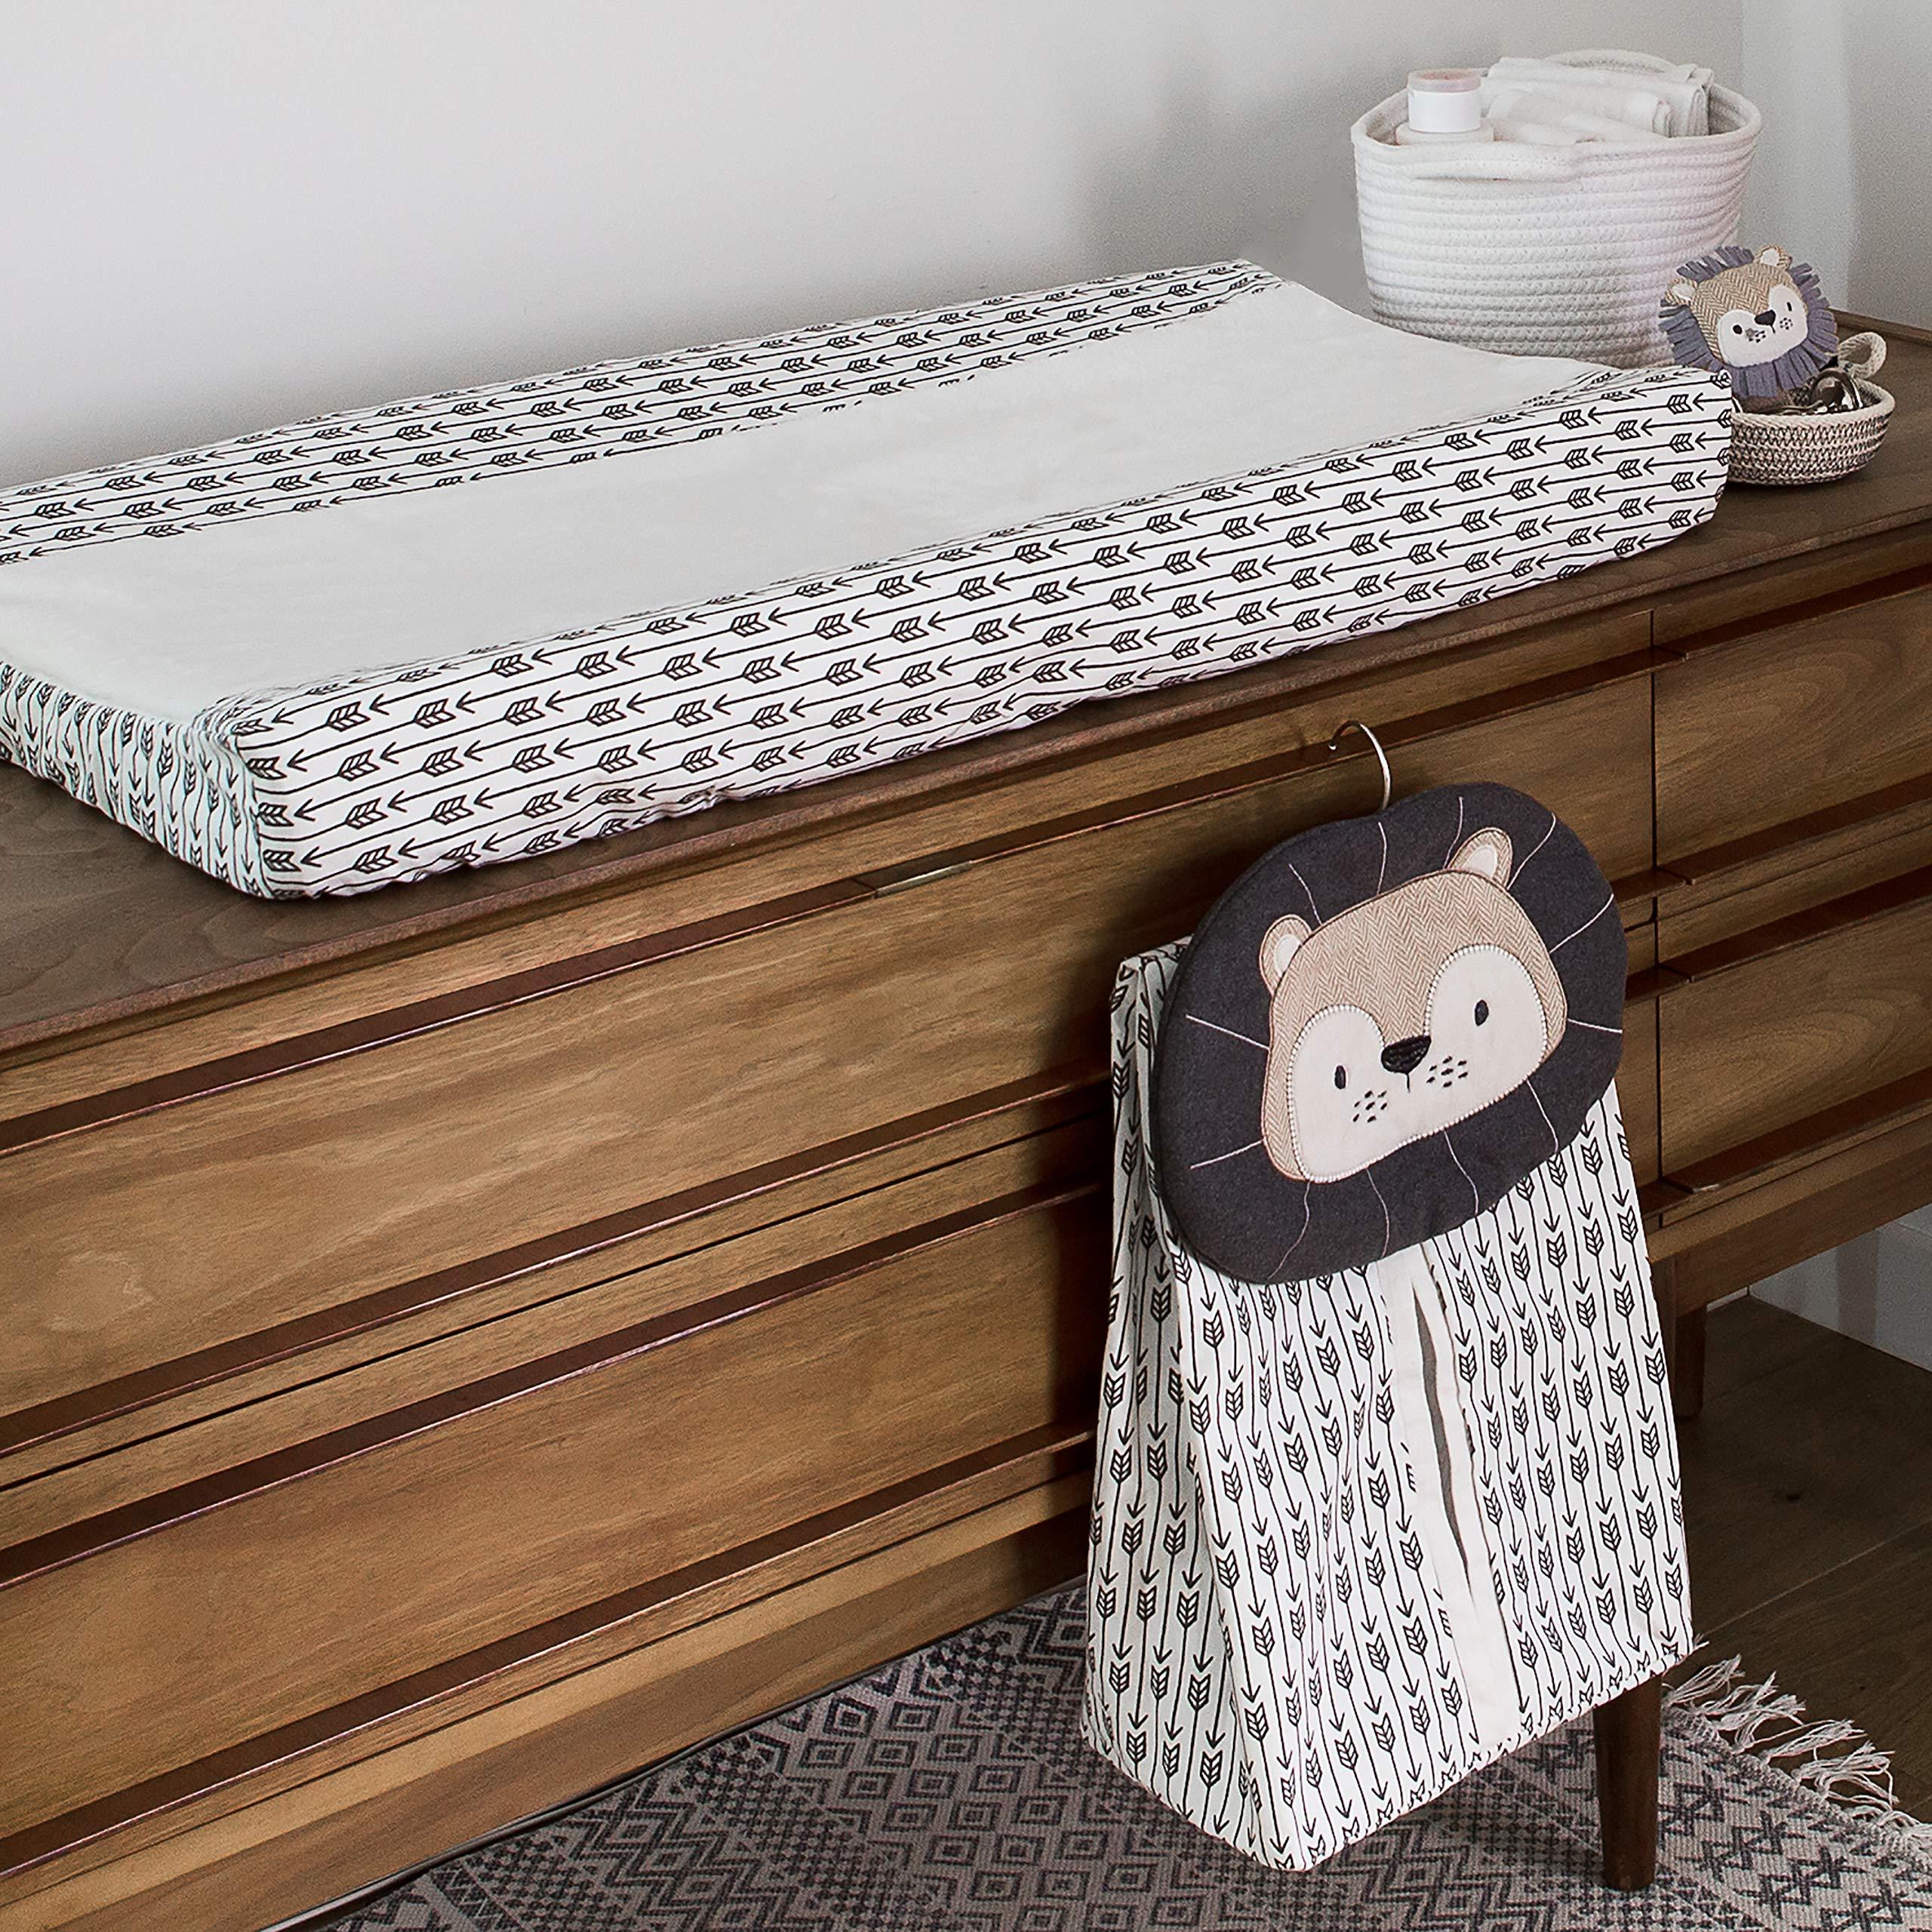 Levtex Baby Tanzania Neutral 5-Piece Crib Bedding Set, Grey/Black/Cream/Tan by Levtex (Image #5)